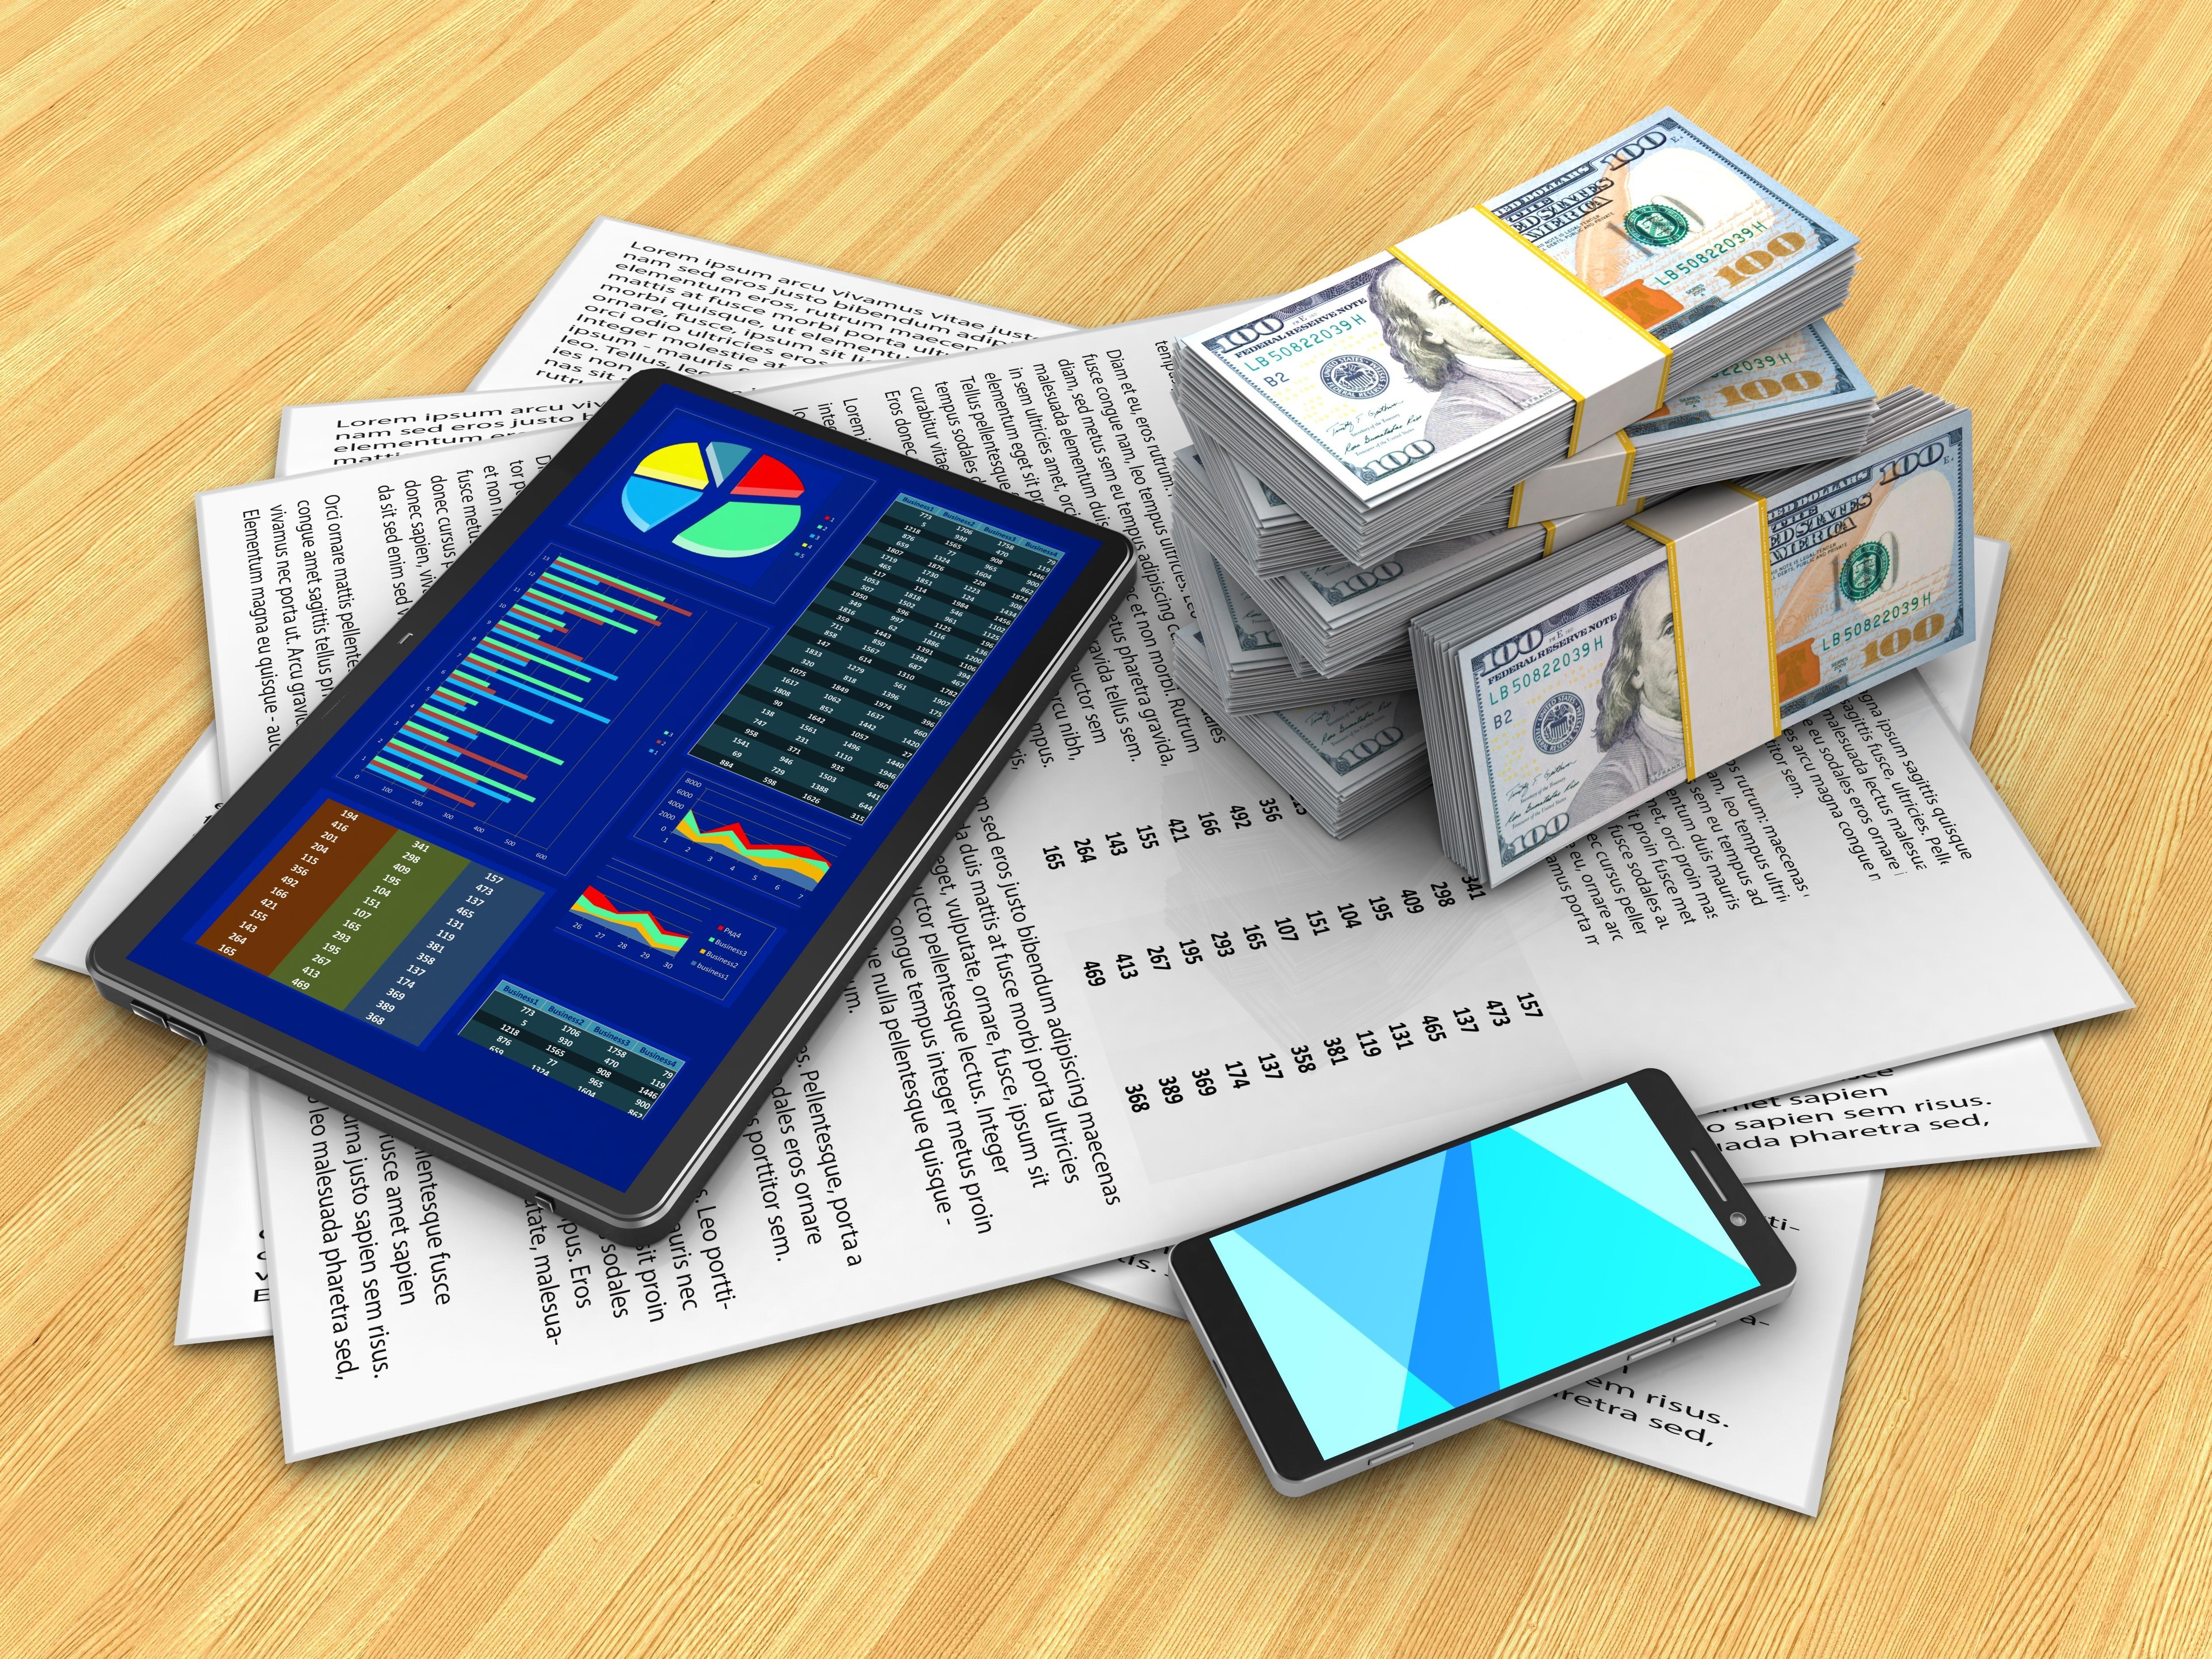 Streamlining Processes, Accelerating Reimbursement Can Boost MDF Utilization